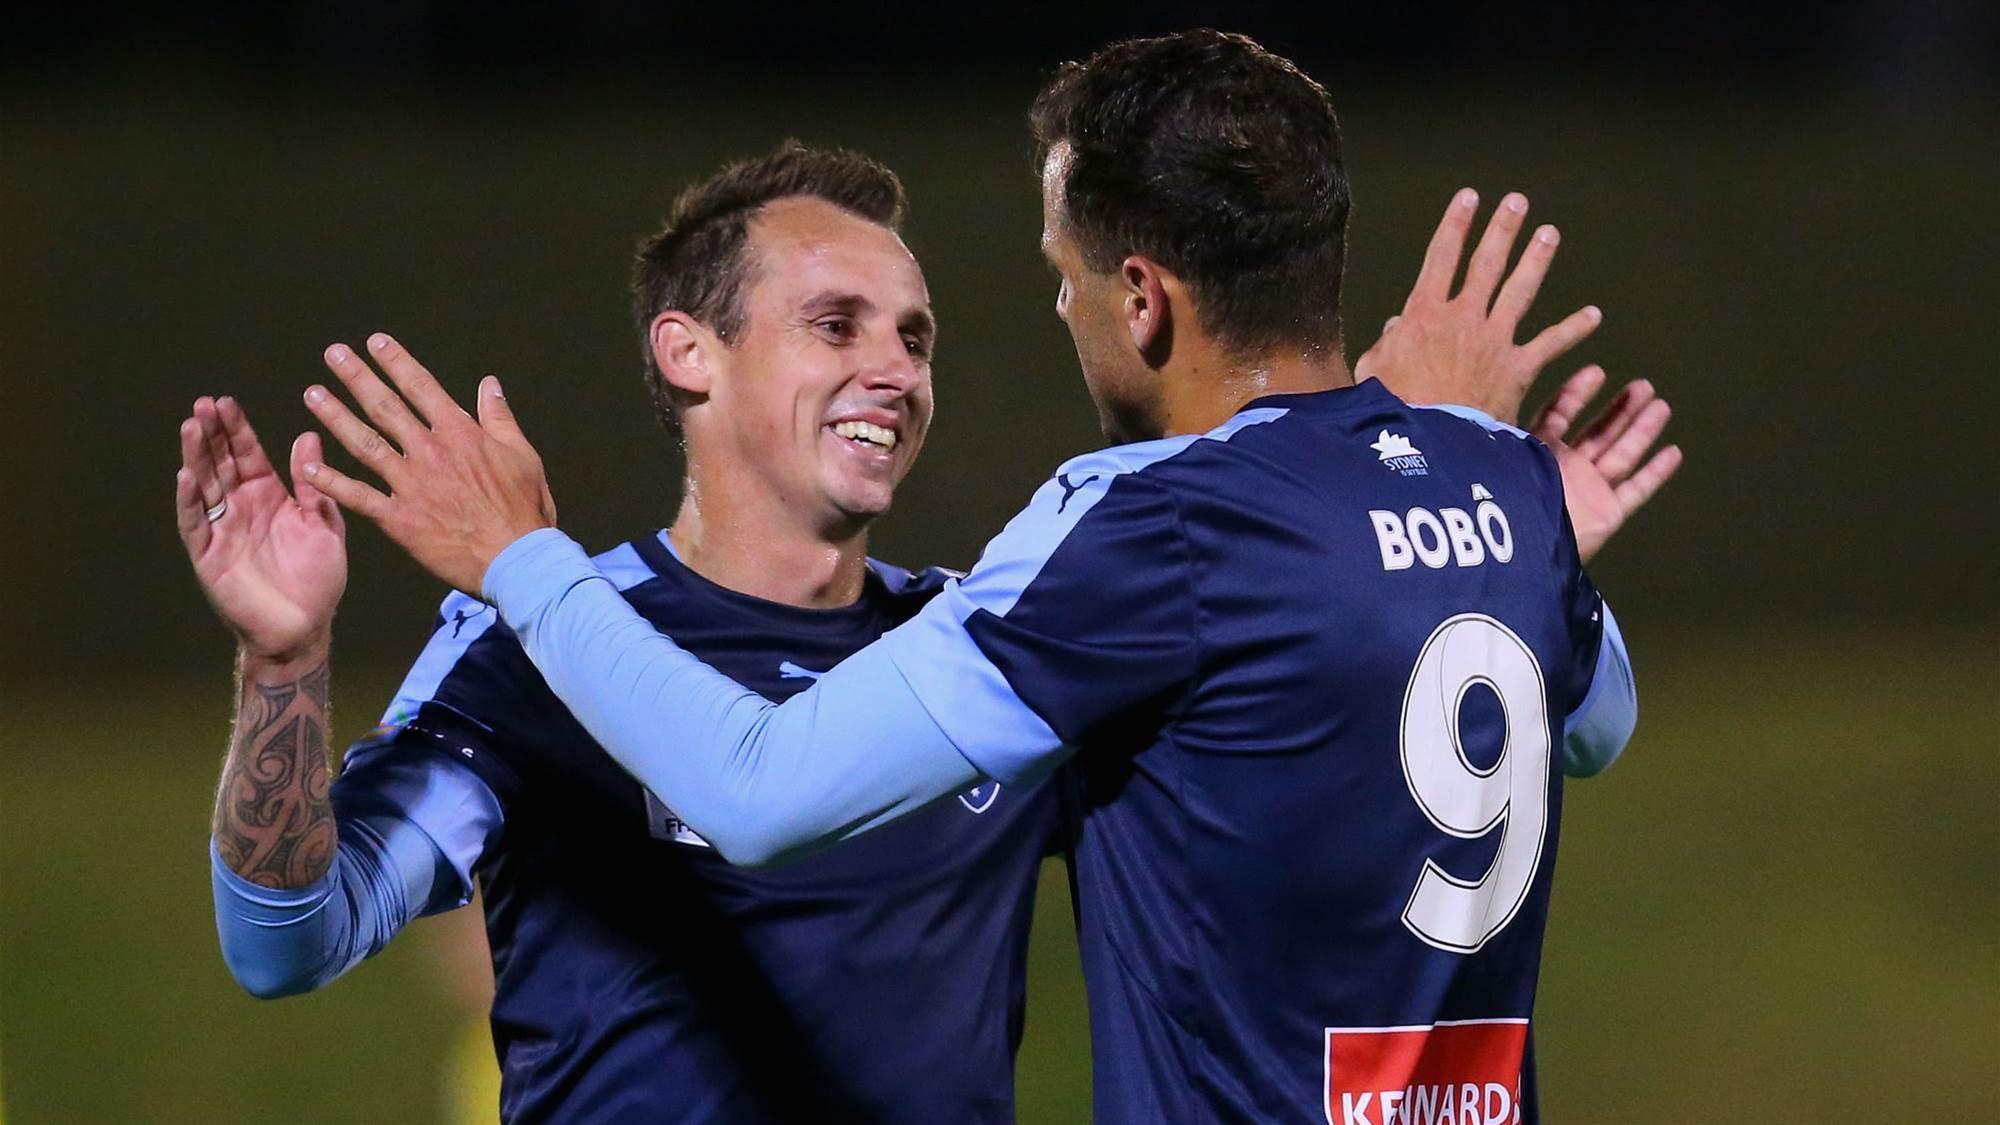 Bobo shines as Sydney FC down Glory